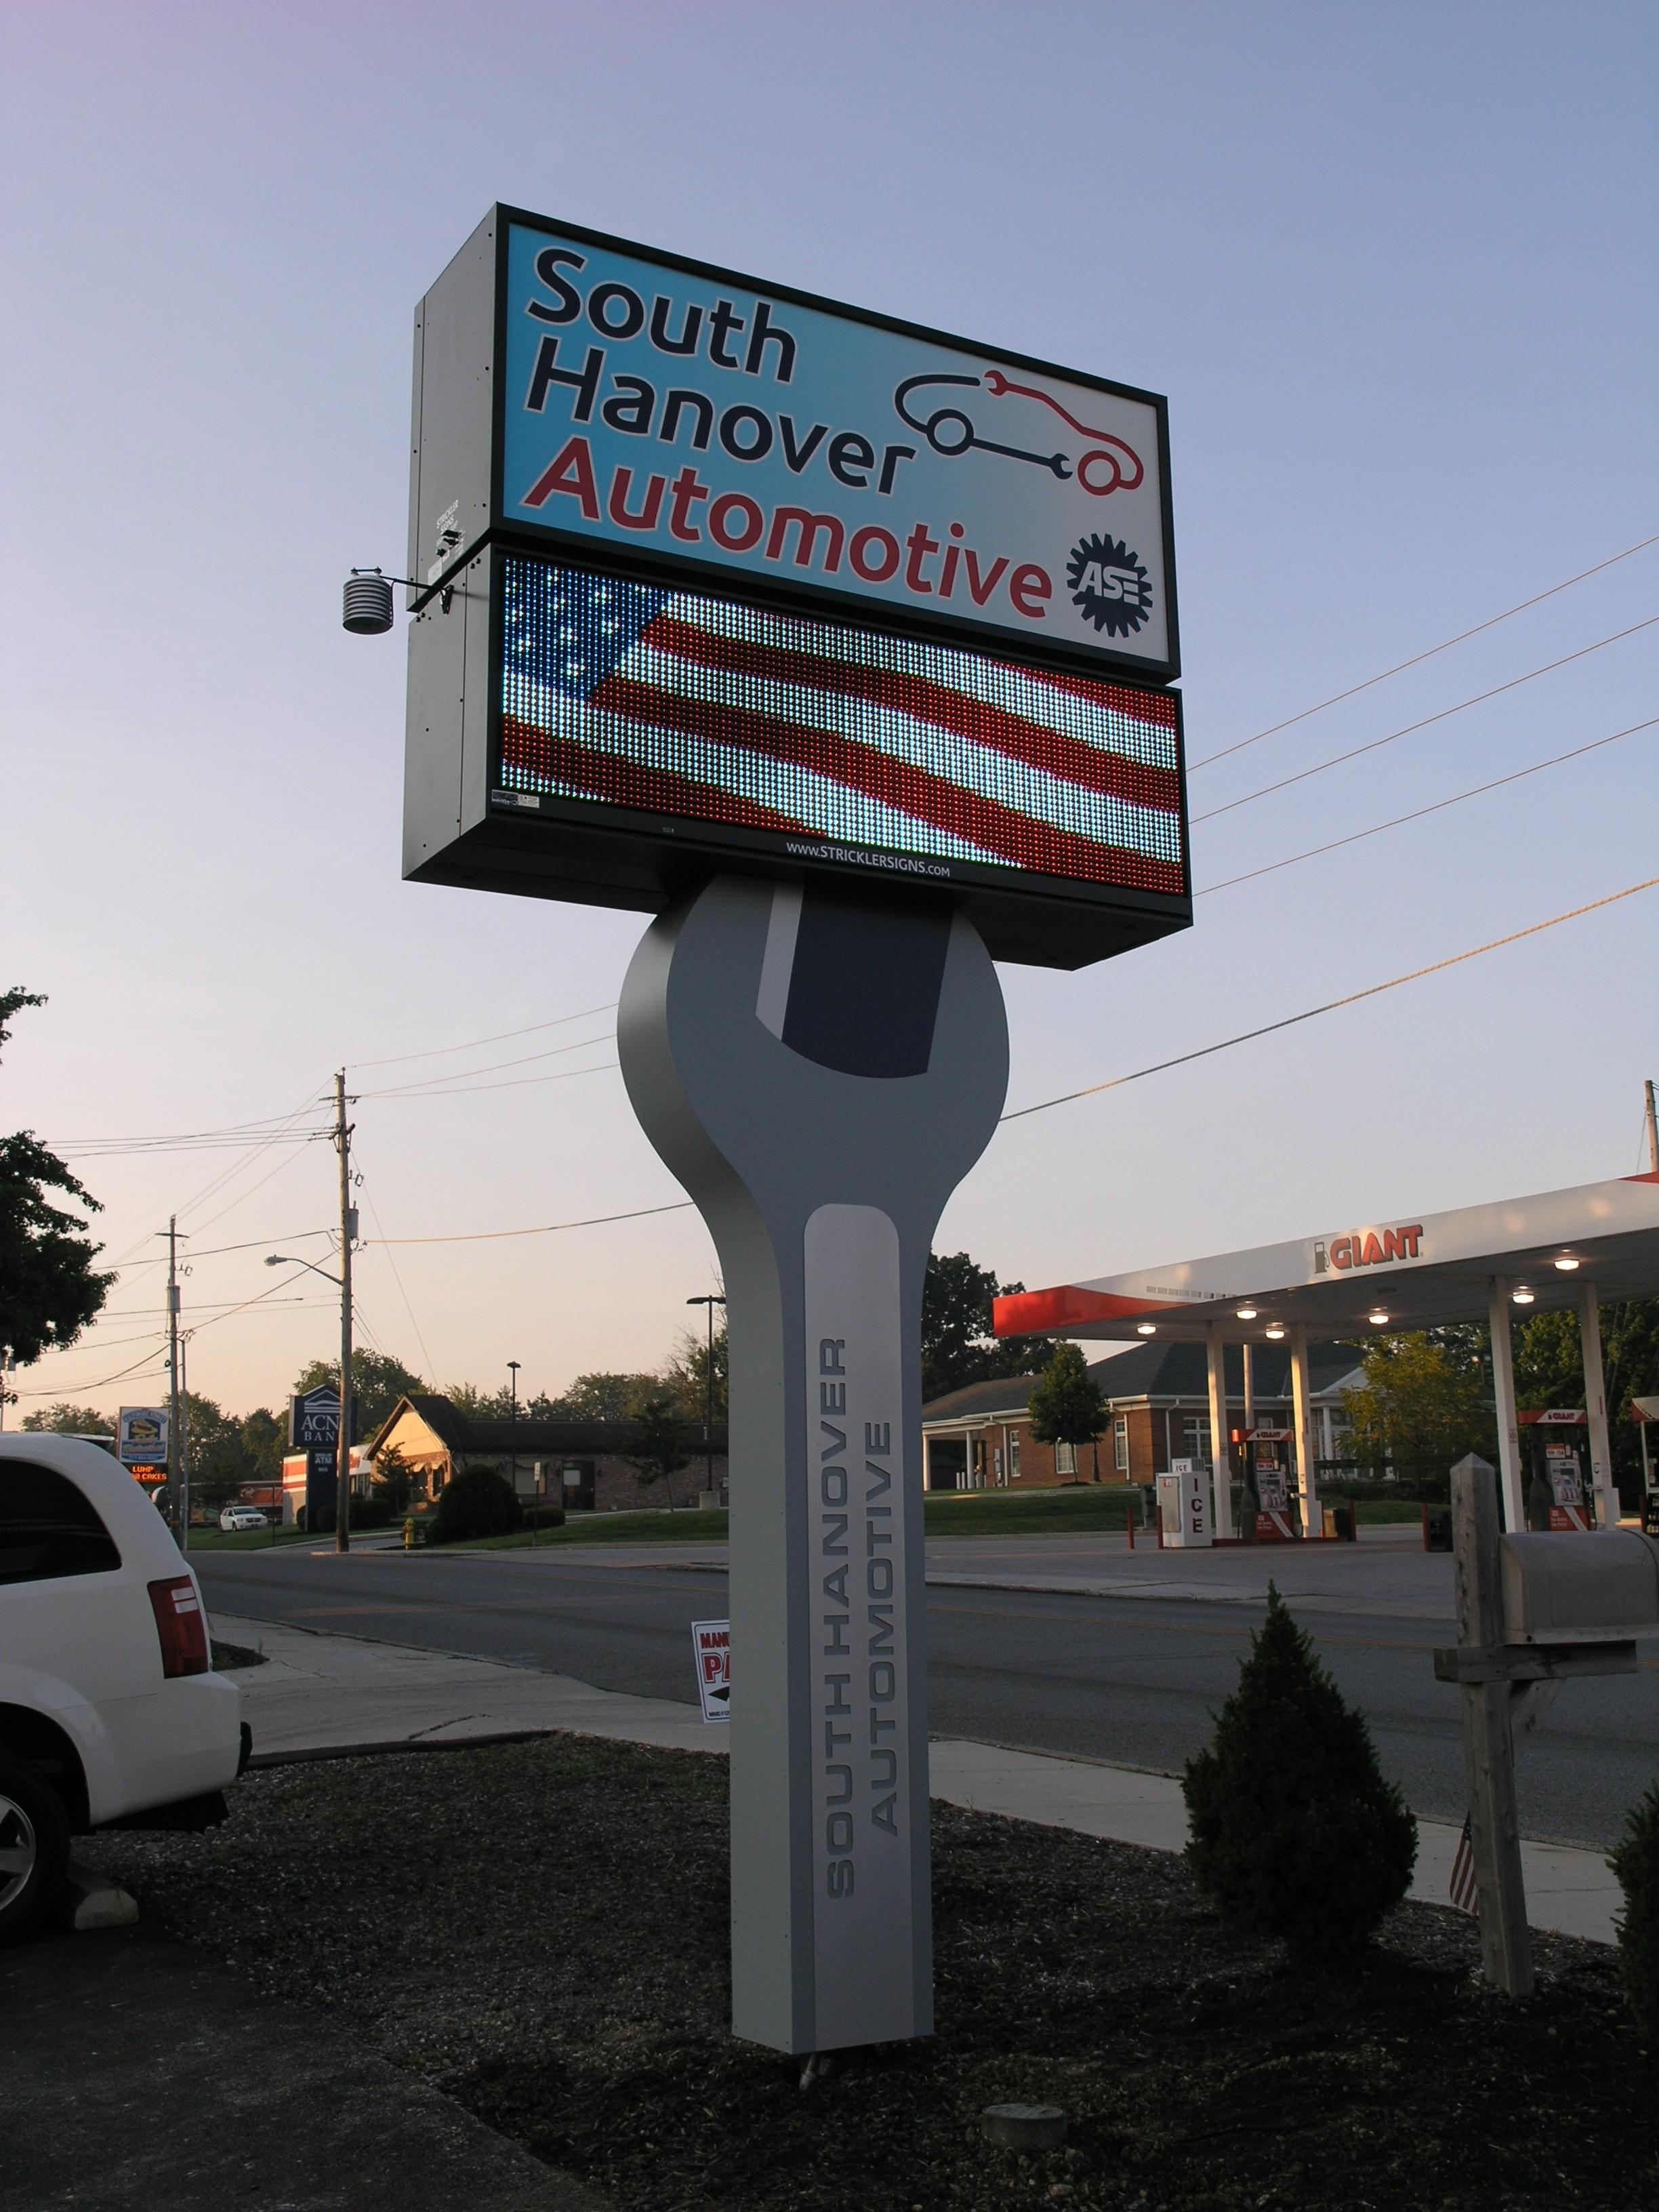 South Hanover Auto - Pylon w Digital Sign